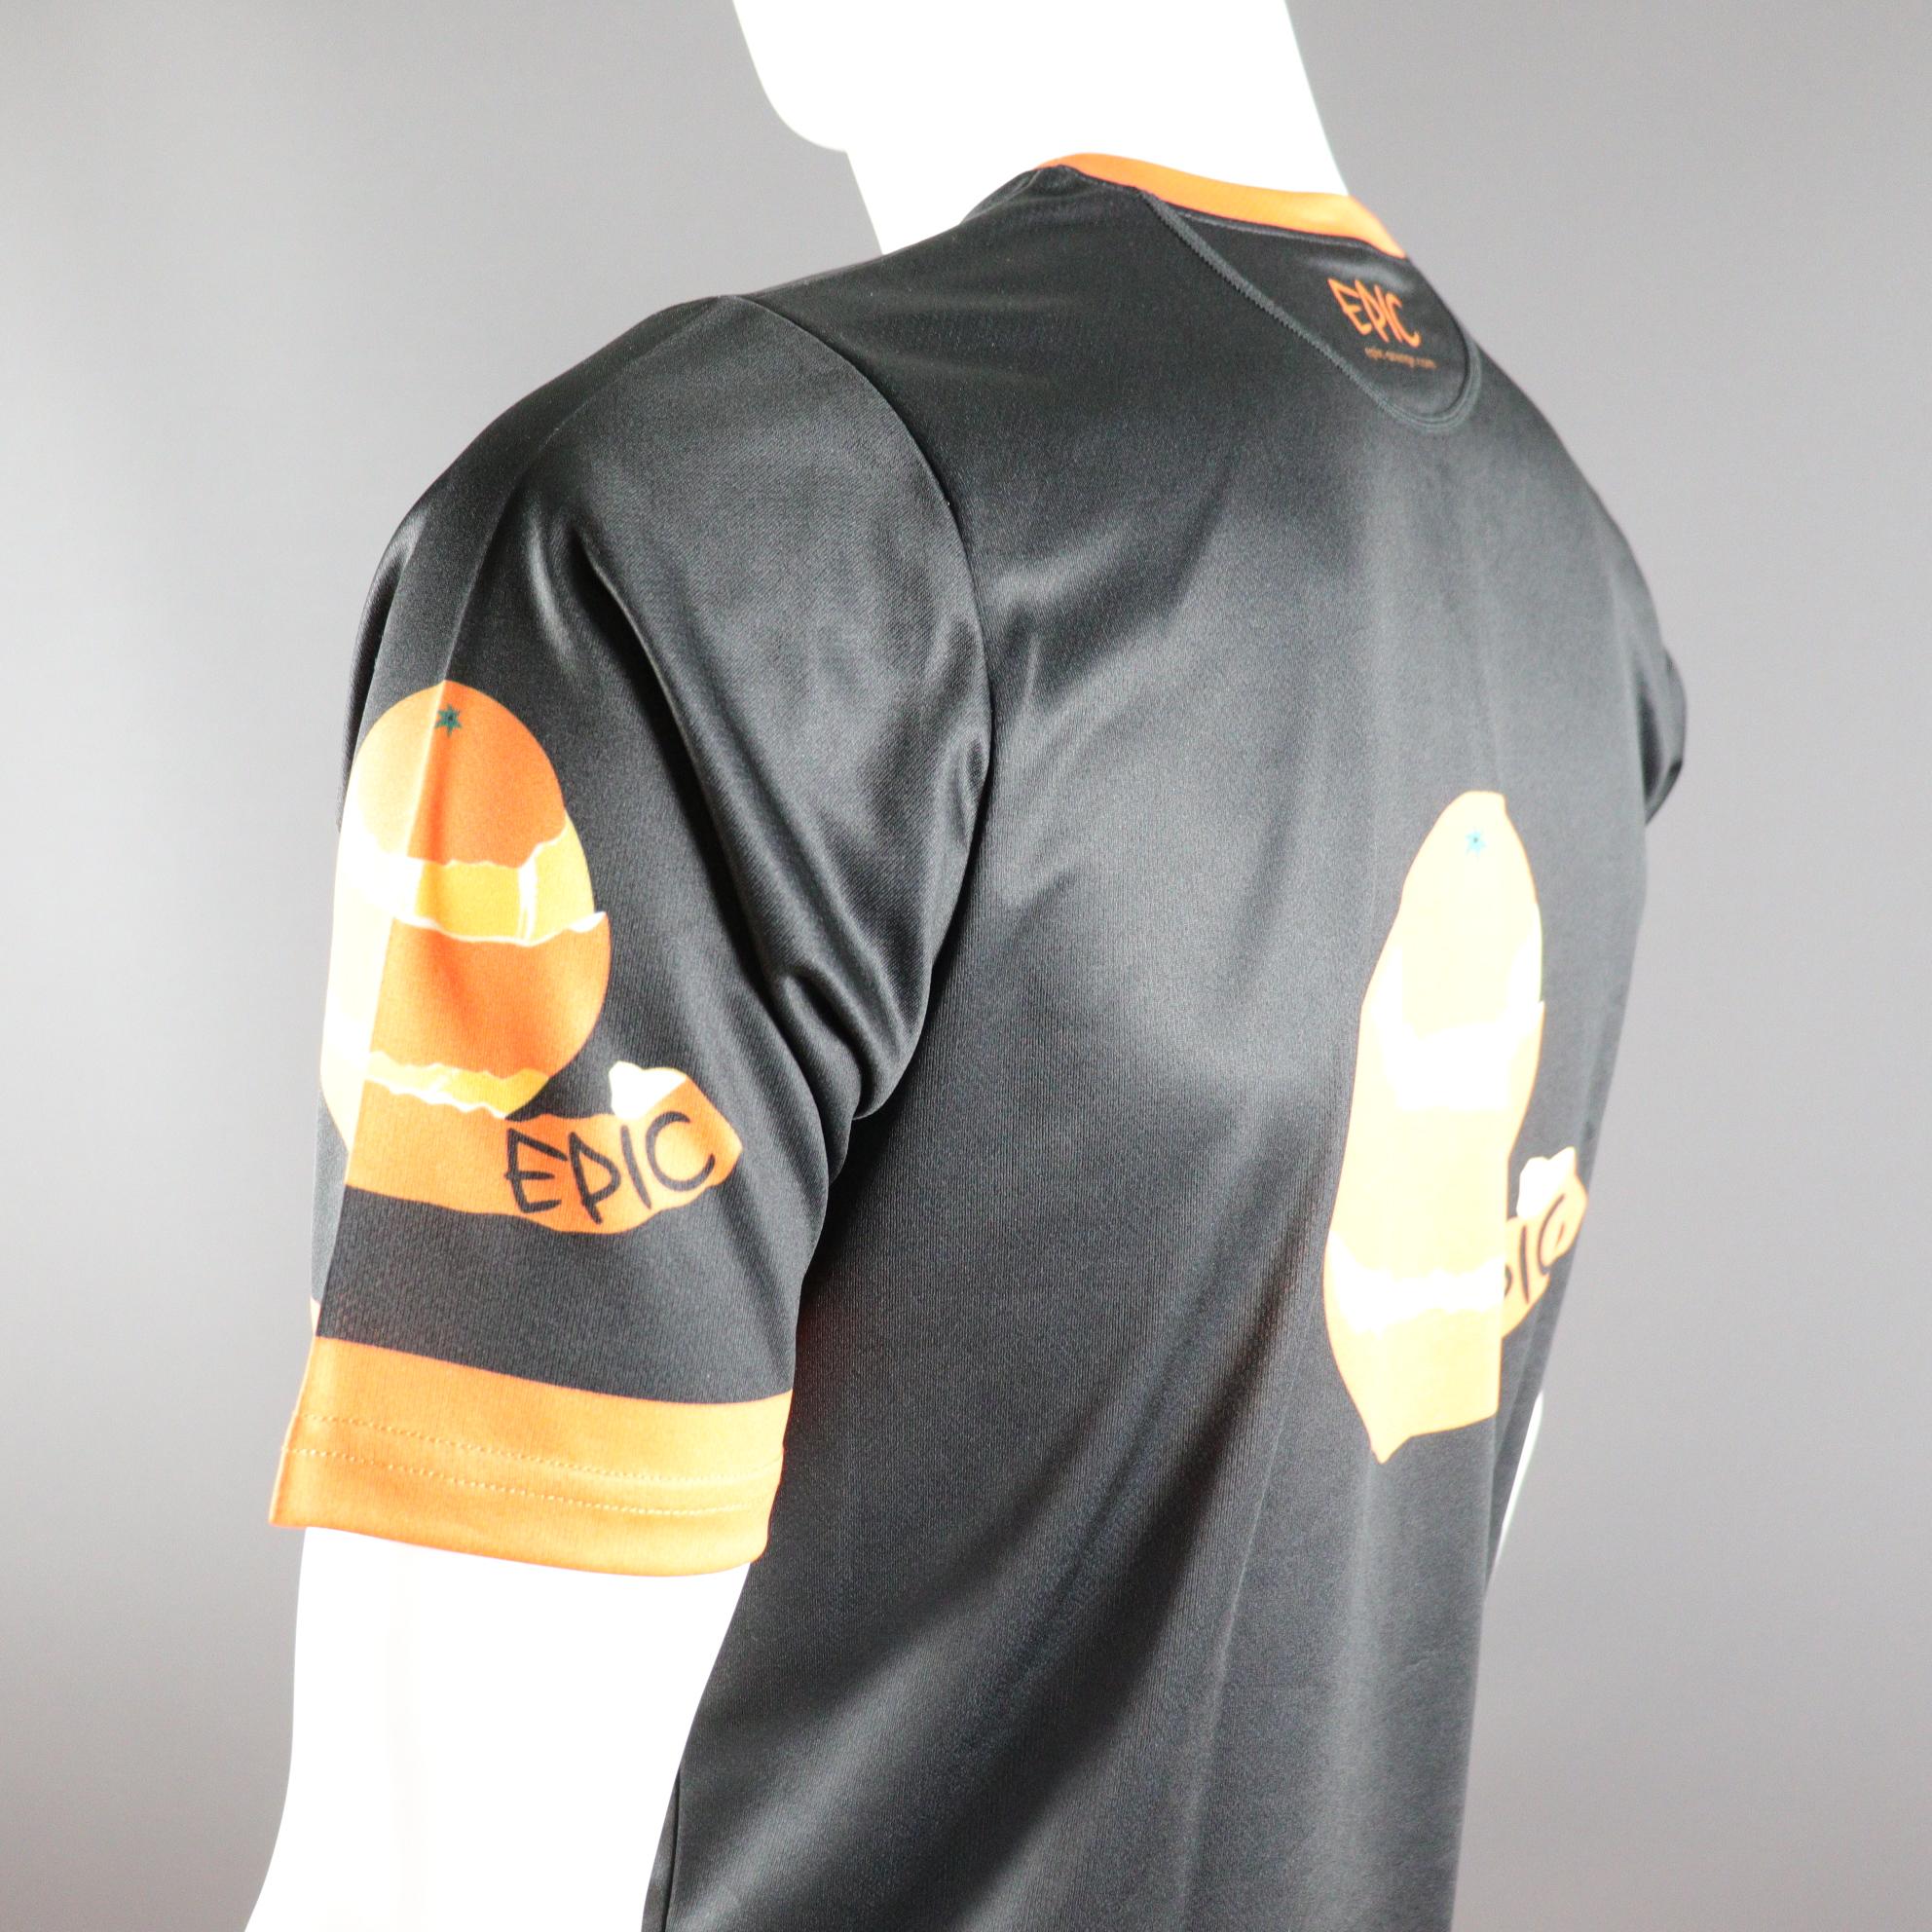 Custom Printed Racer Tech Run Shirts